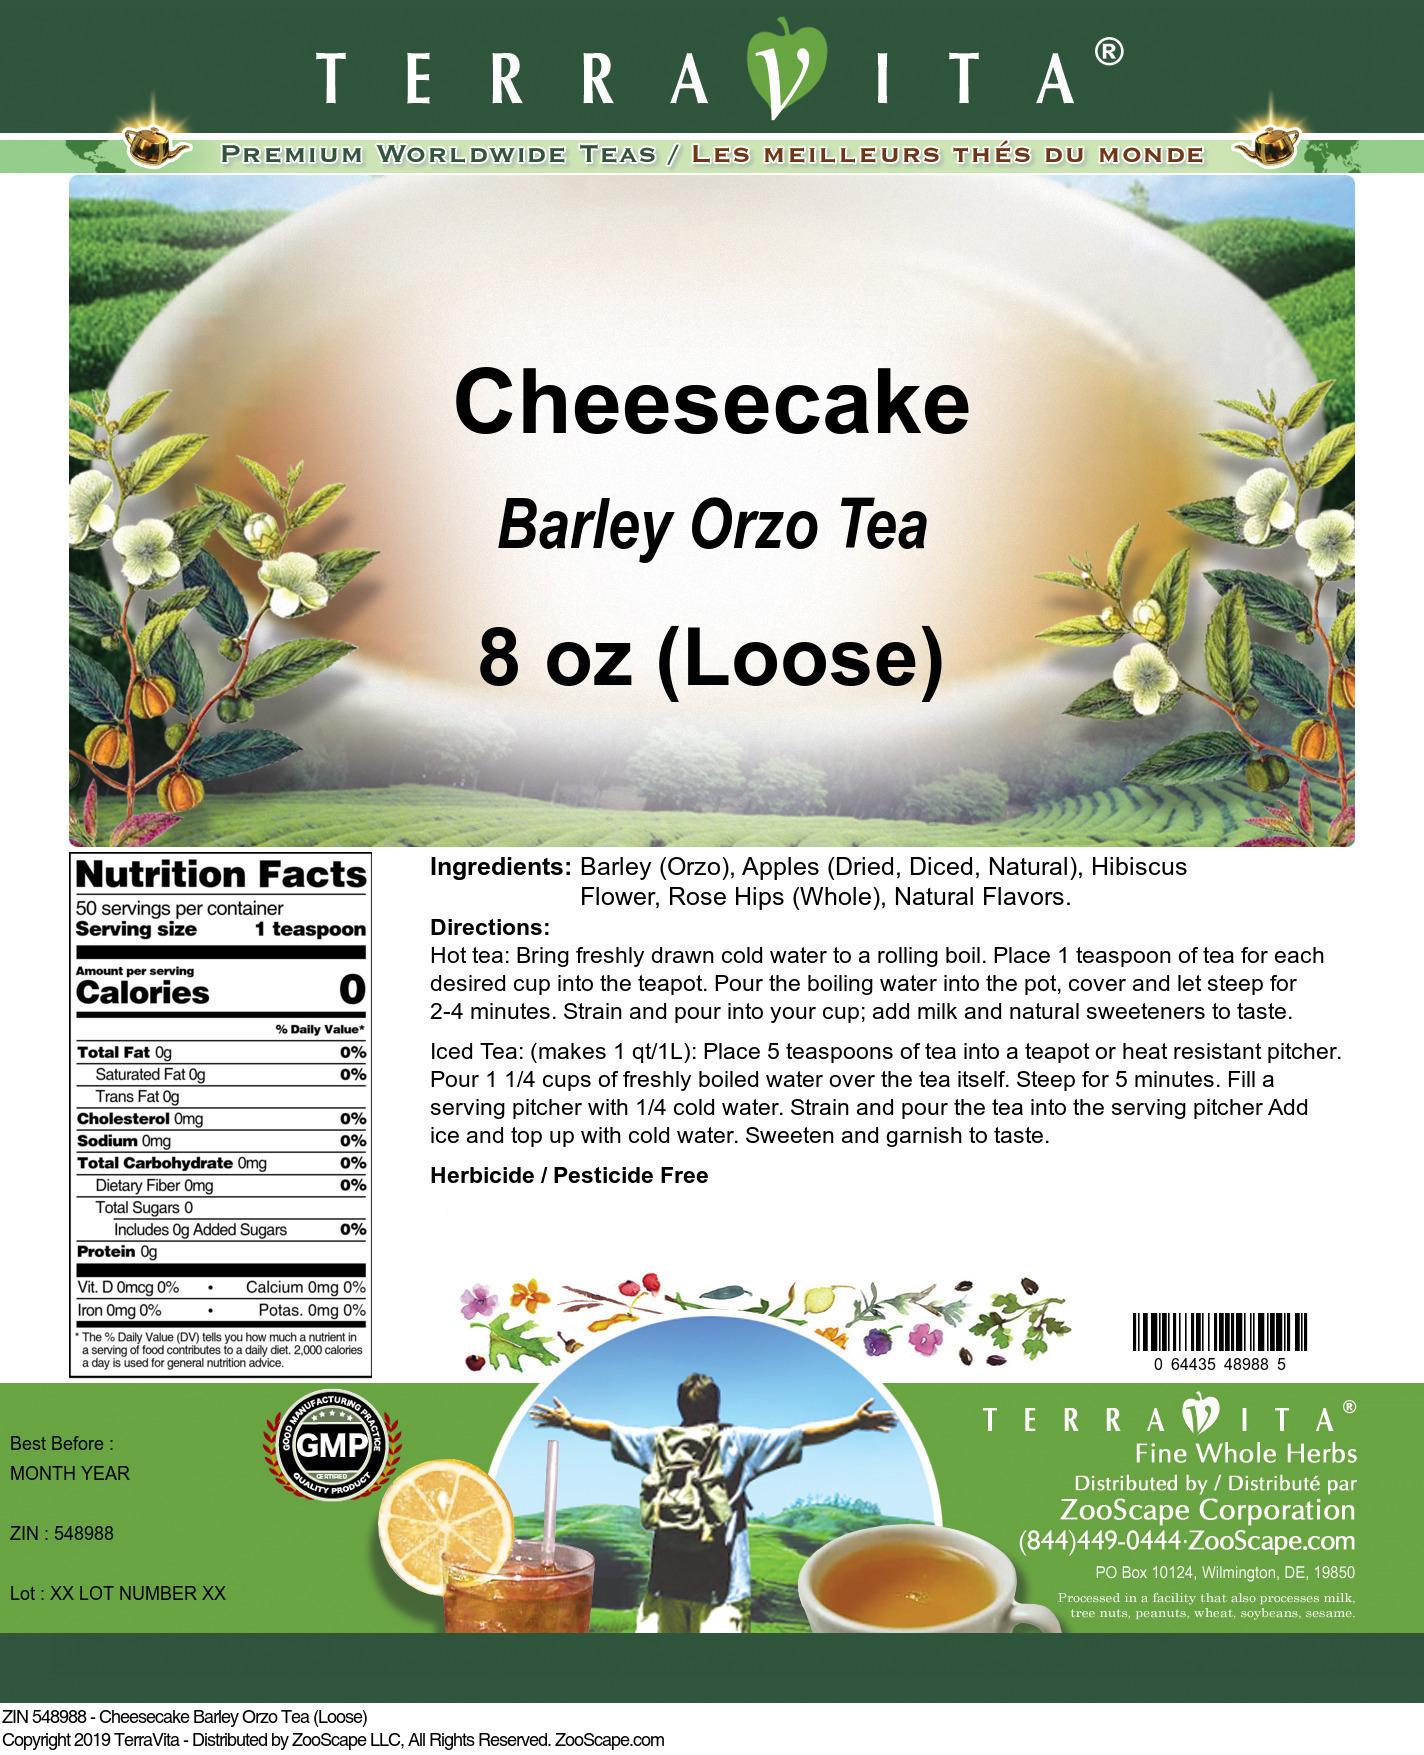 Cheesecake Barley Orzo Tea (Loose)